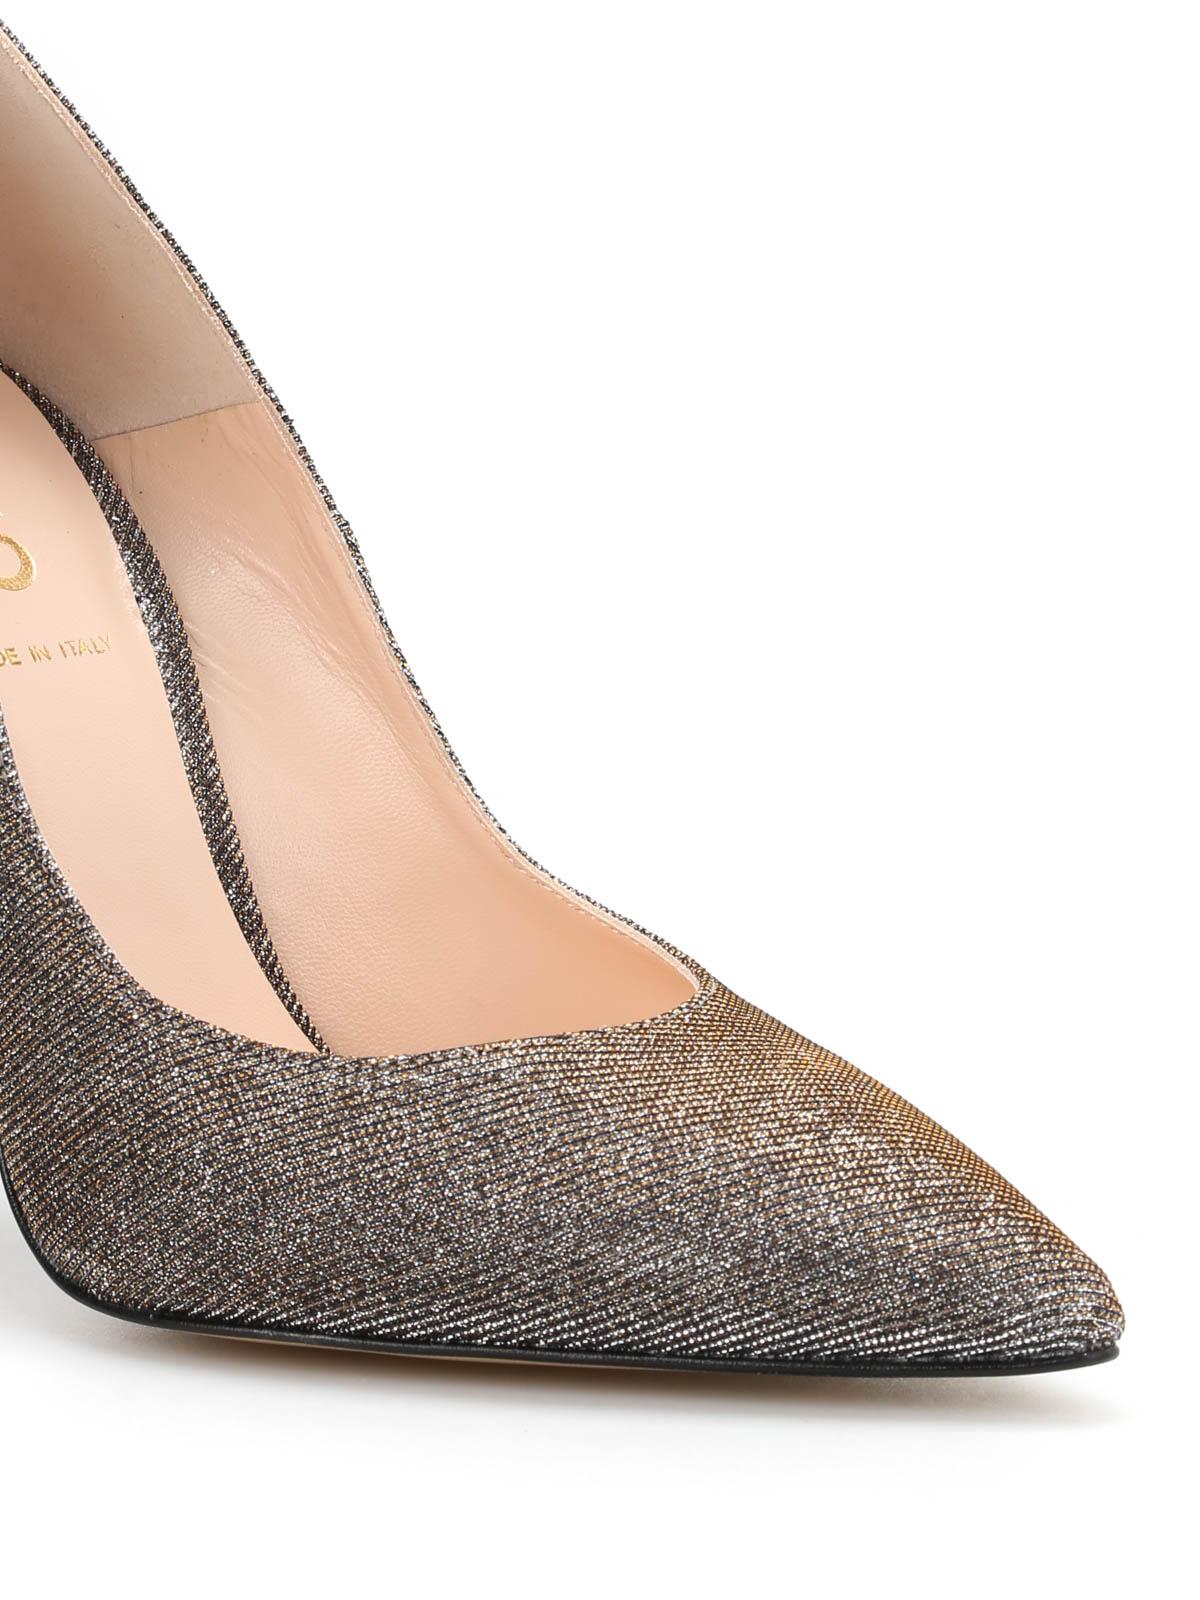 Low heel court shoes | Shop online LIU JO